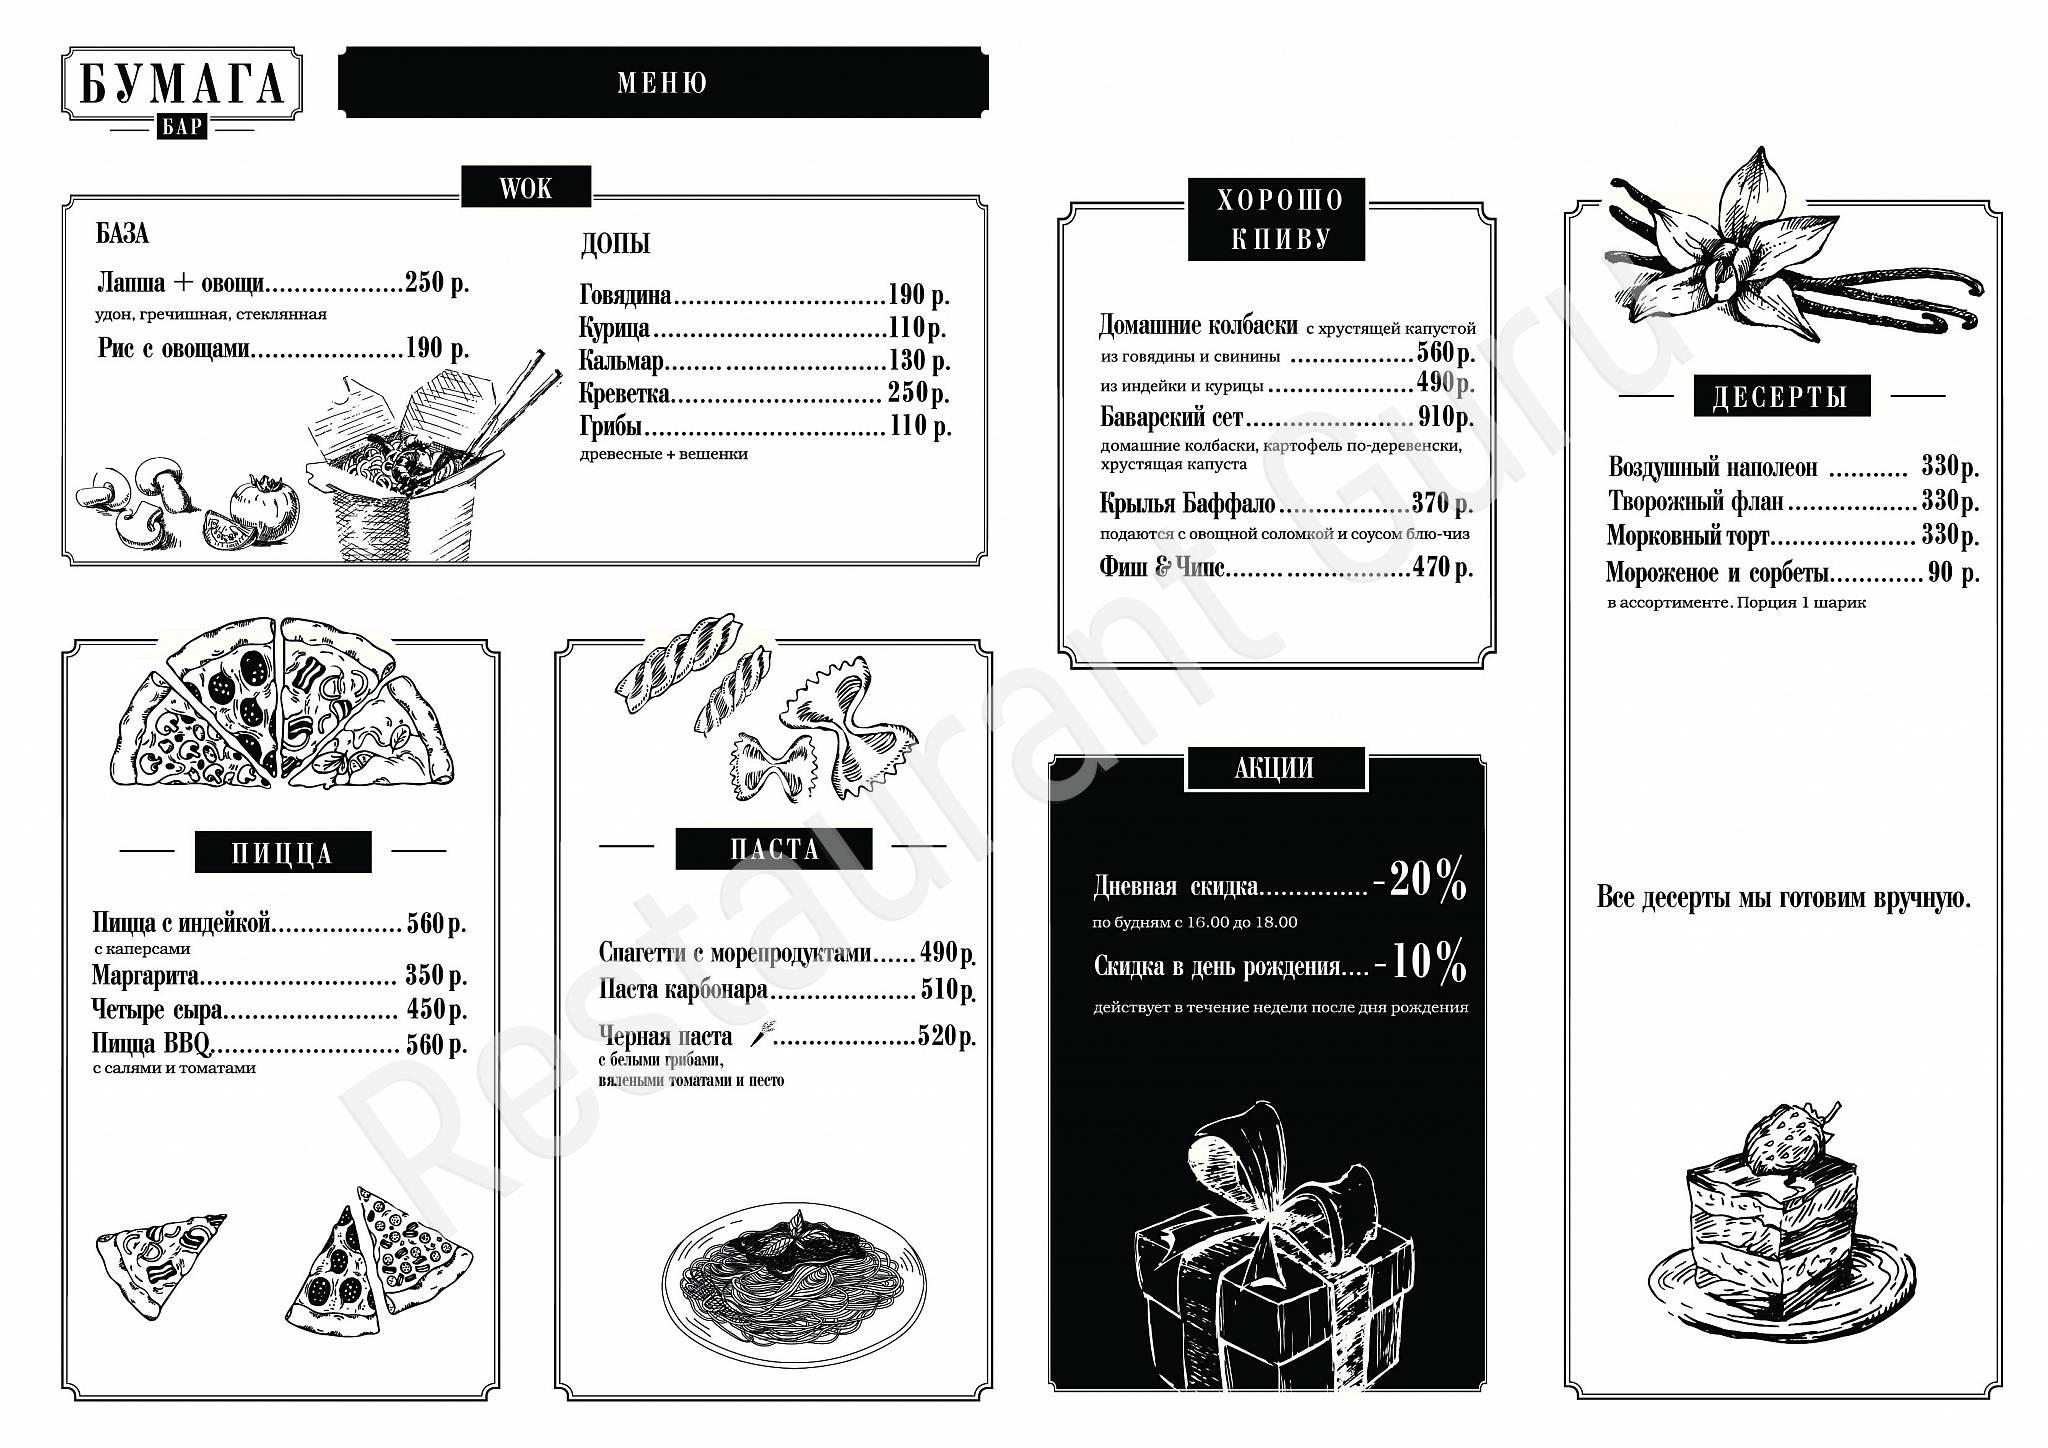 Бумага menu - meals and drinks